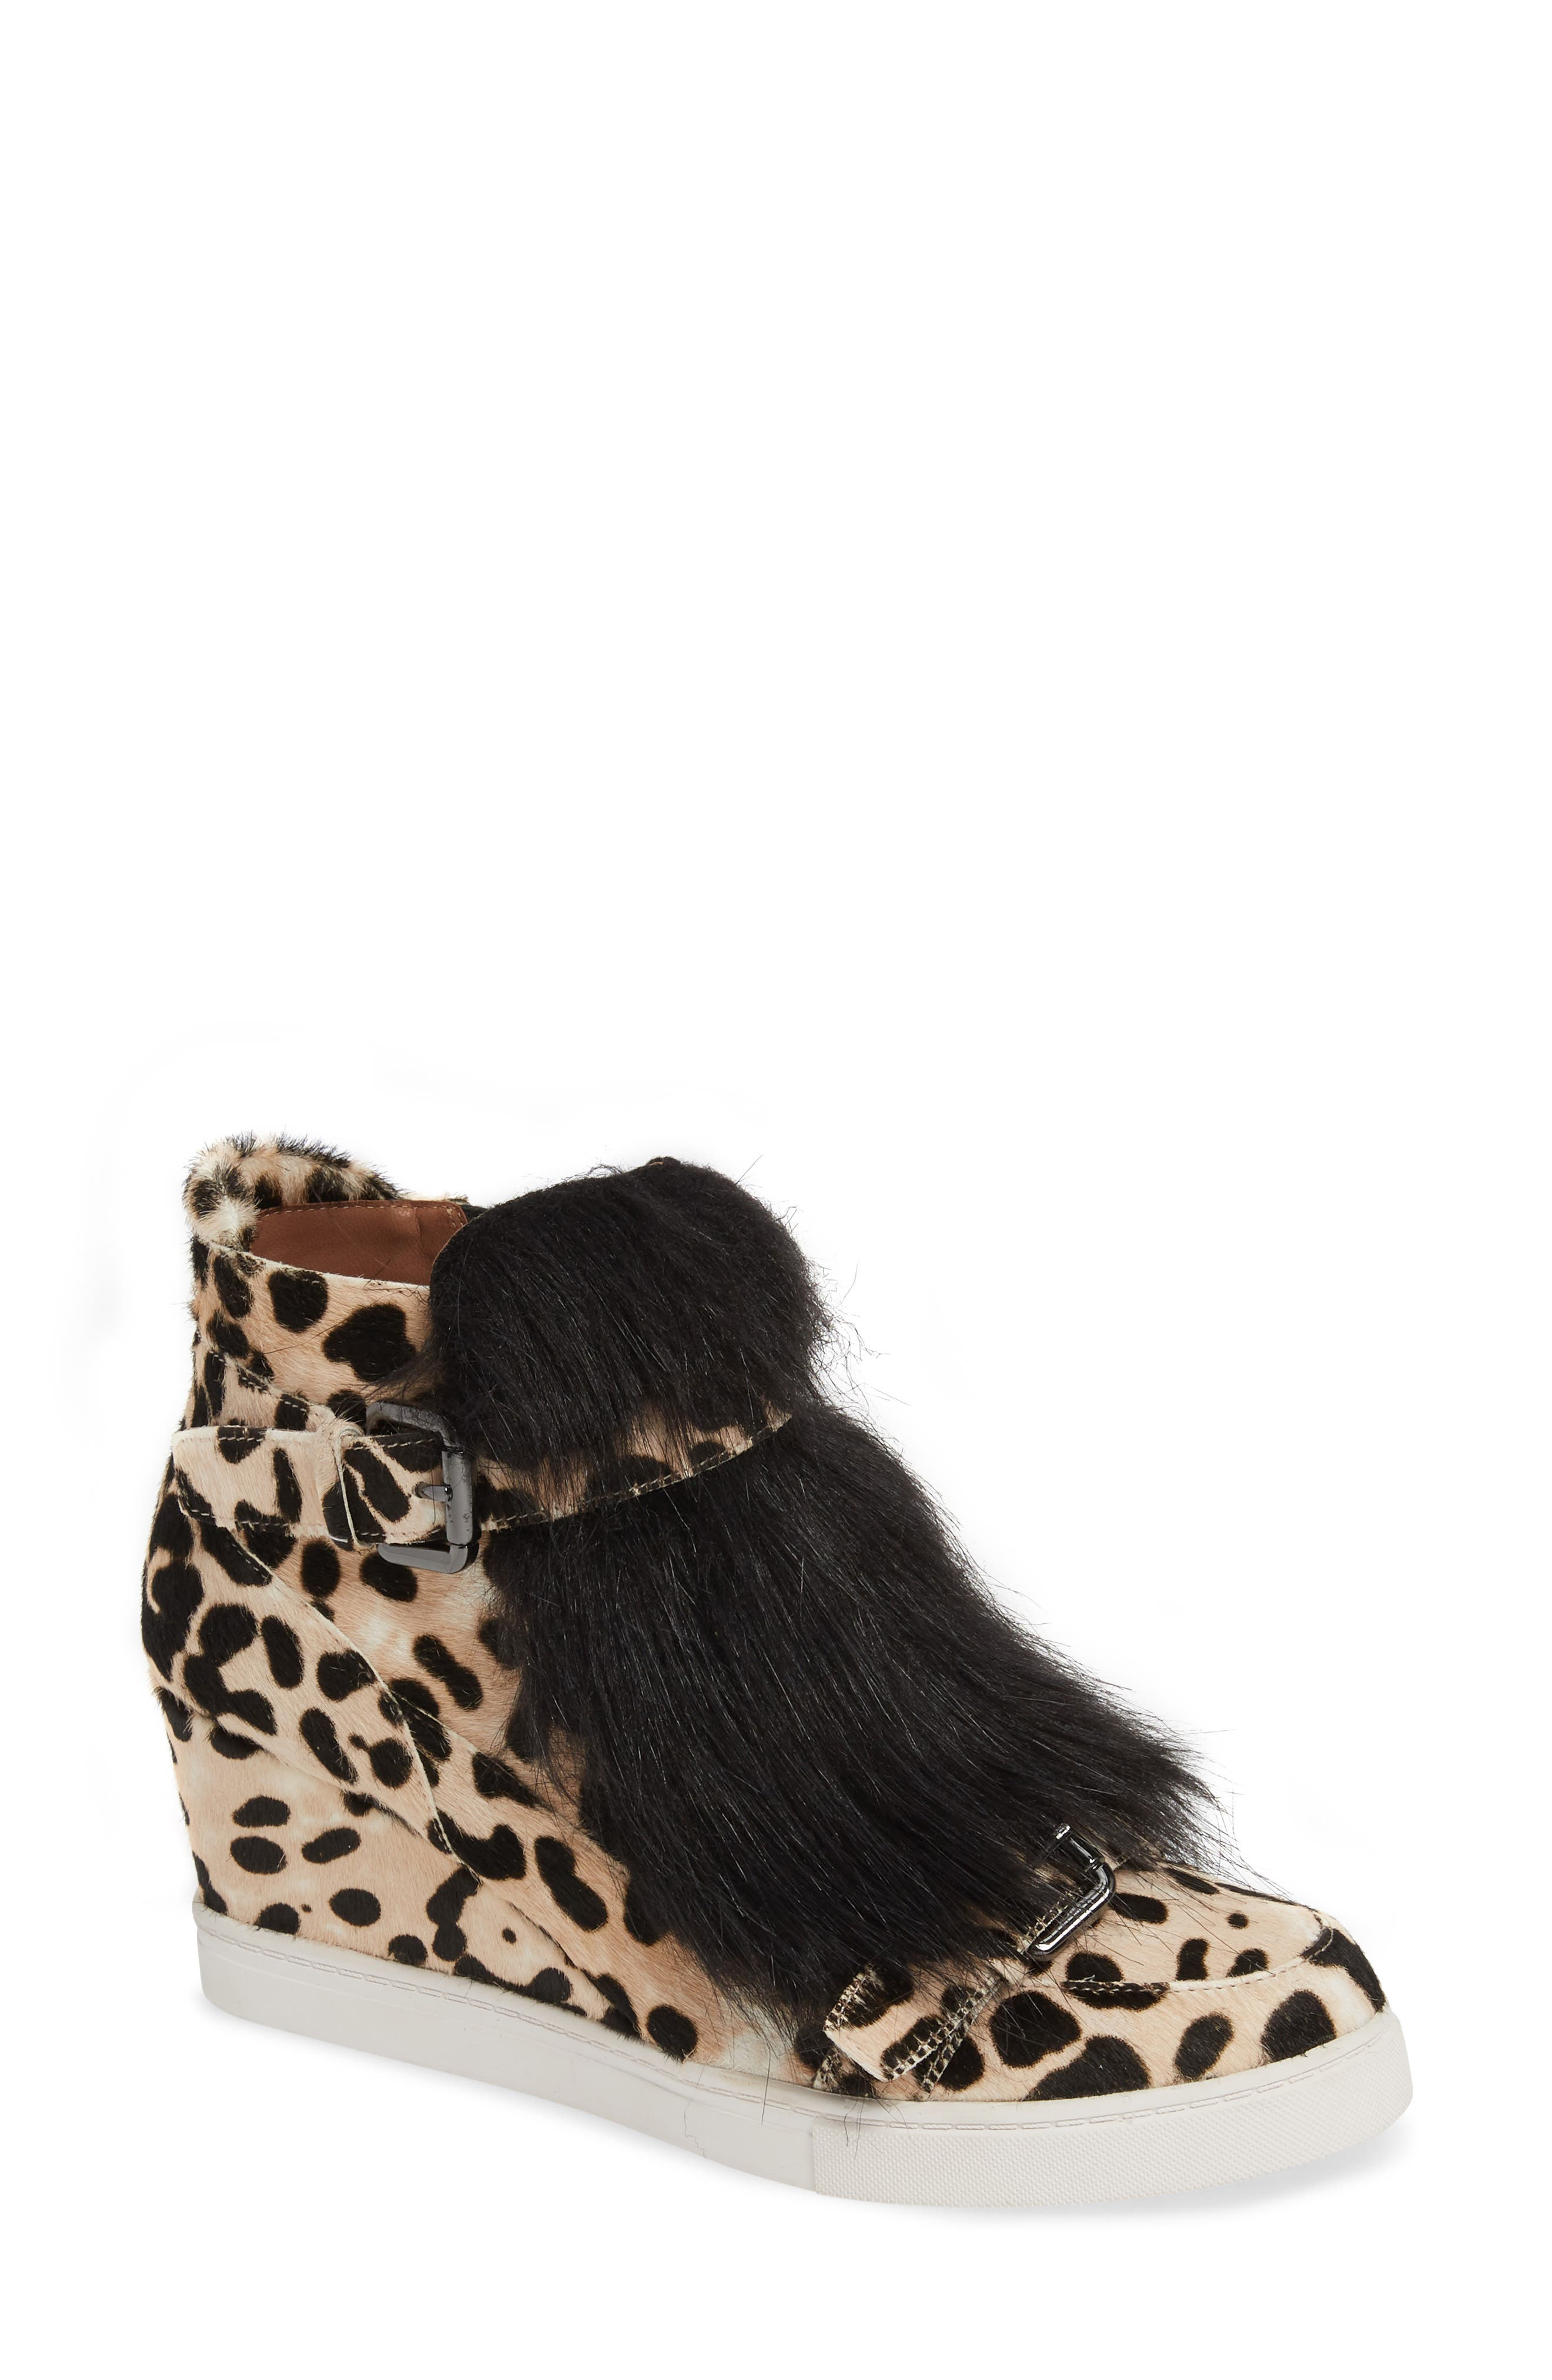 LINEA PAOLO, Fifi 2 Wedge Sneaker, Main thumbnail 1, color, WHITE/ BLACK LEOPARD HAIRCALF